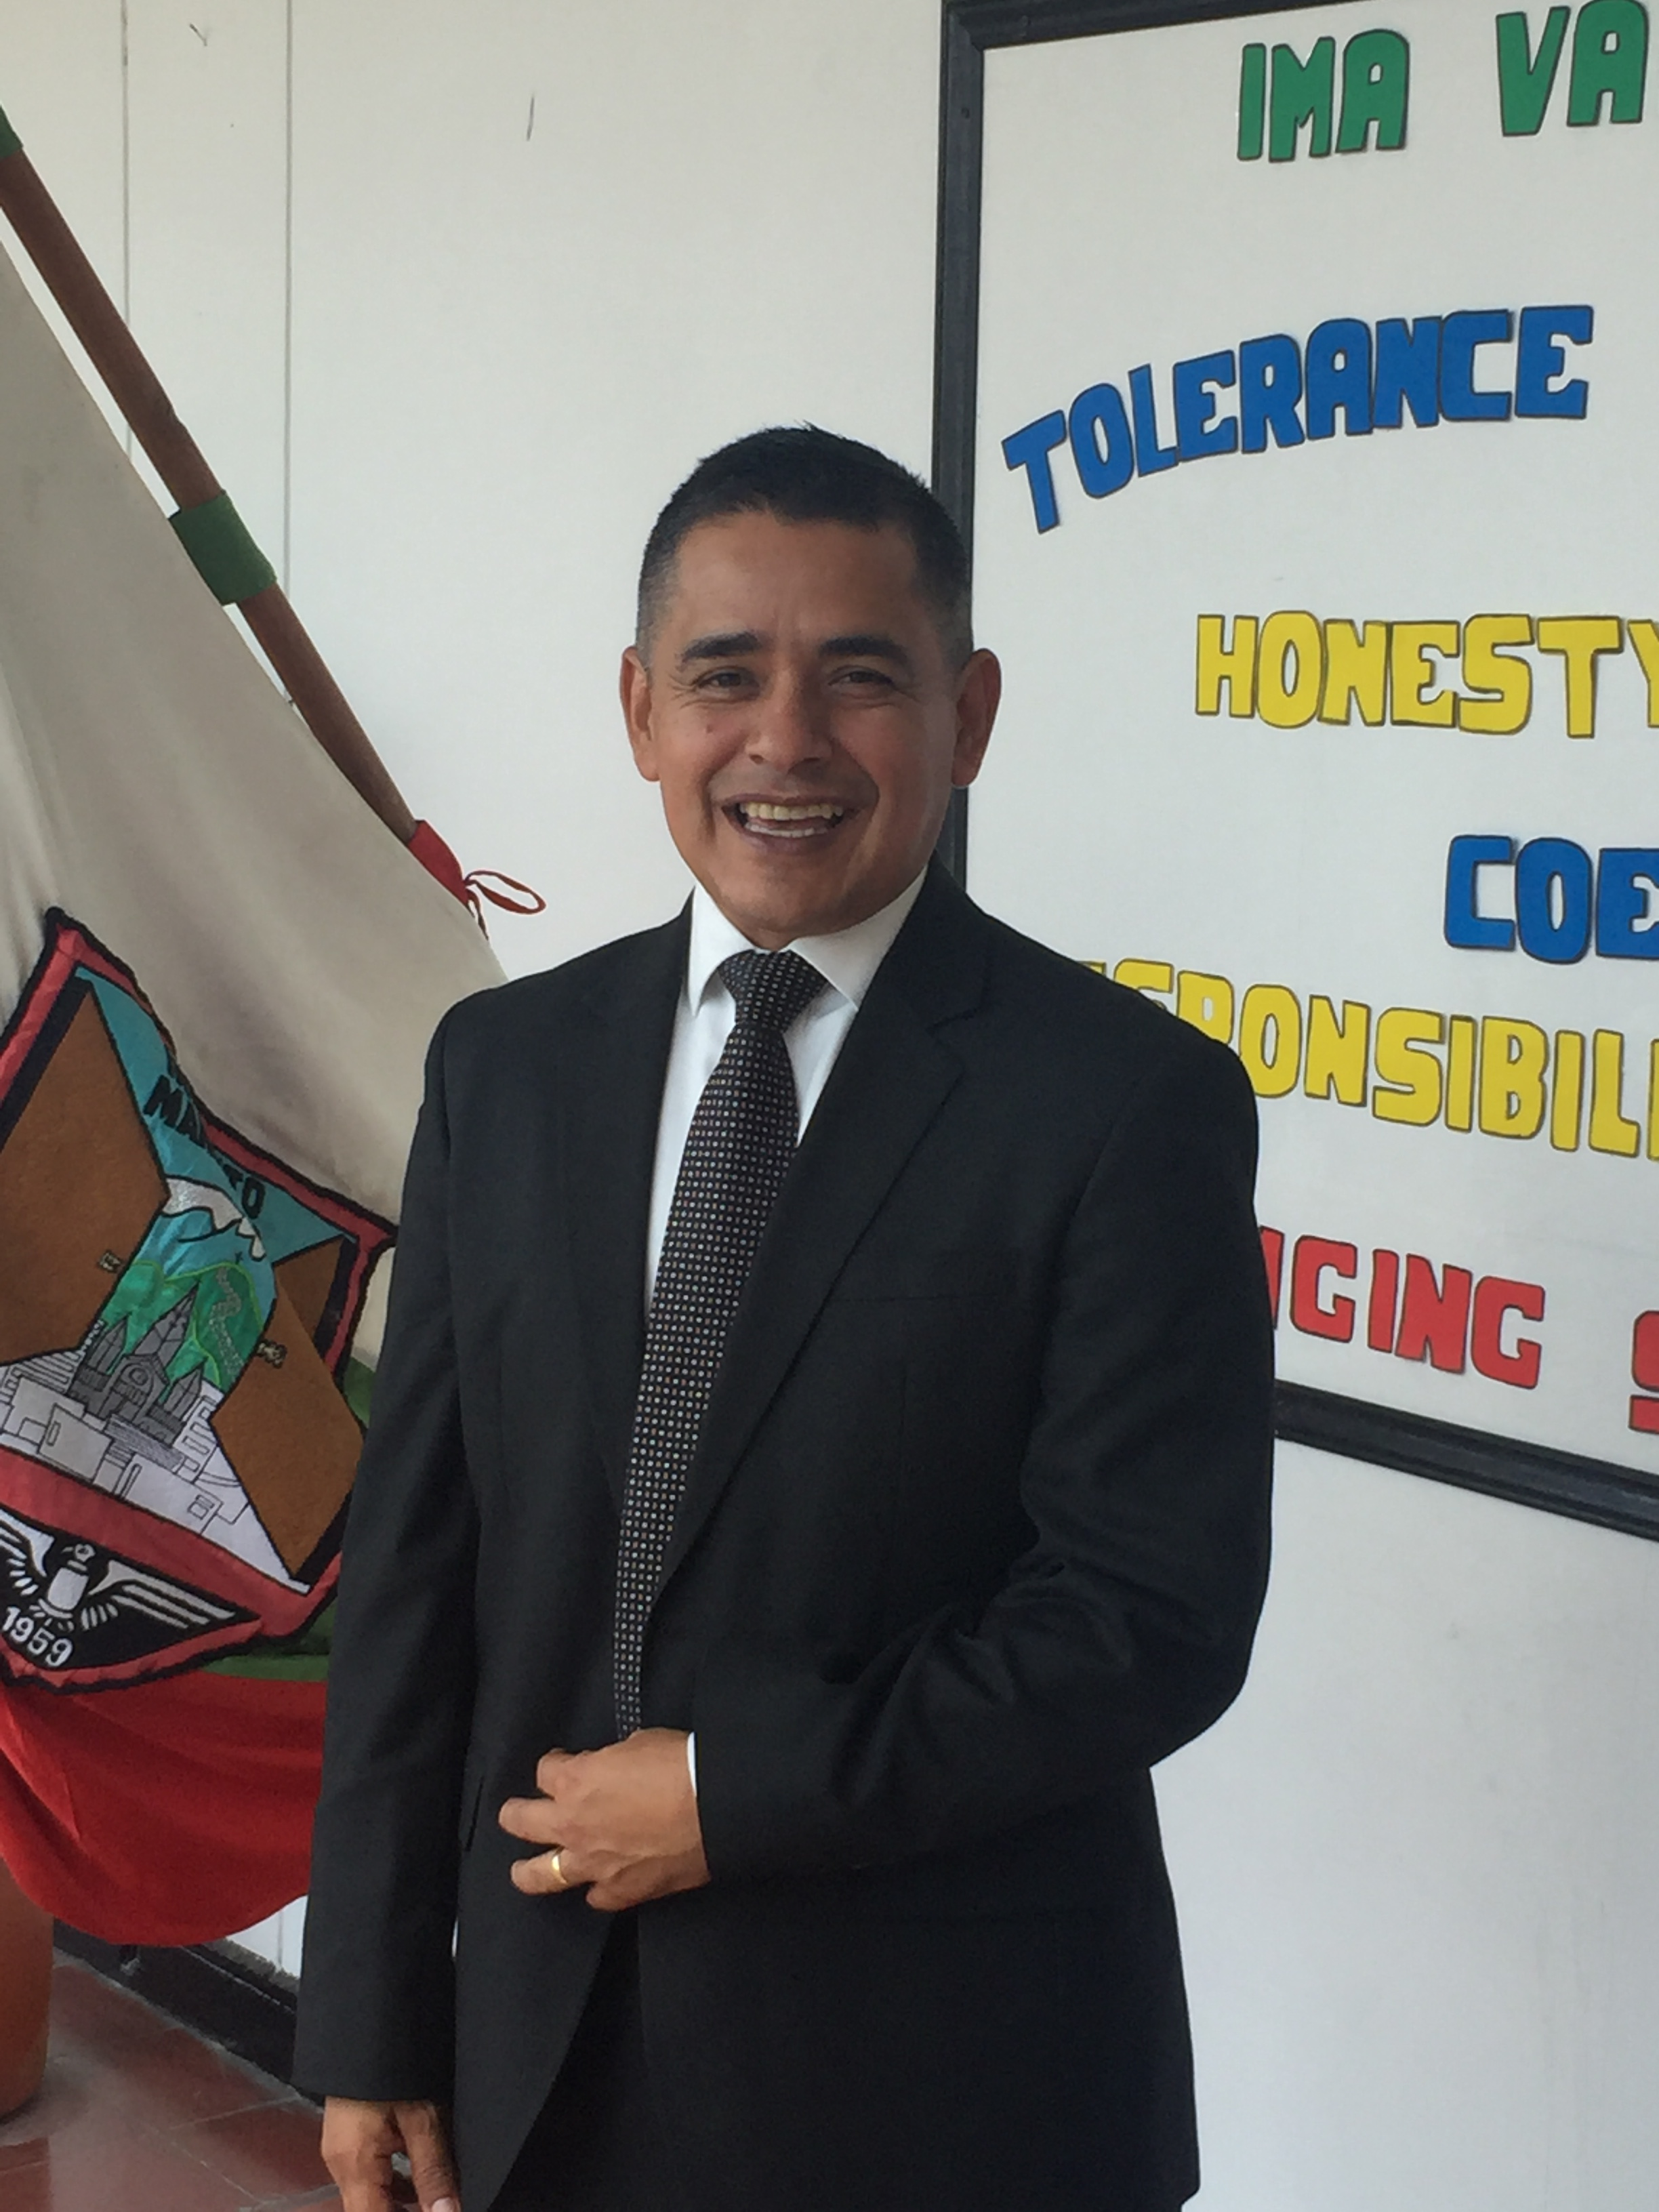 Rector Francis Rodrigo Otero Gil